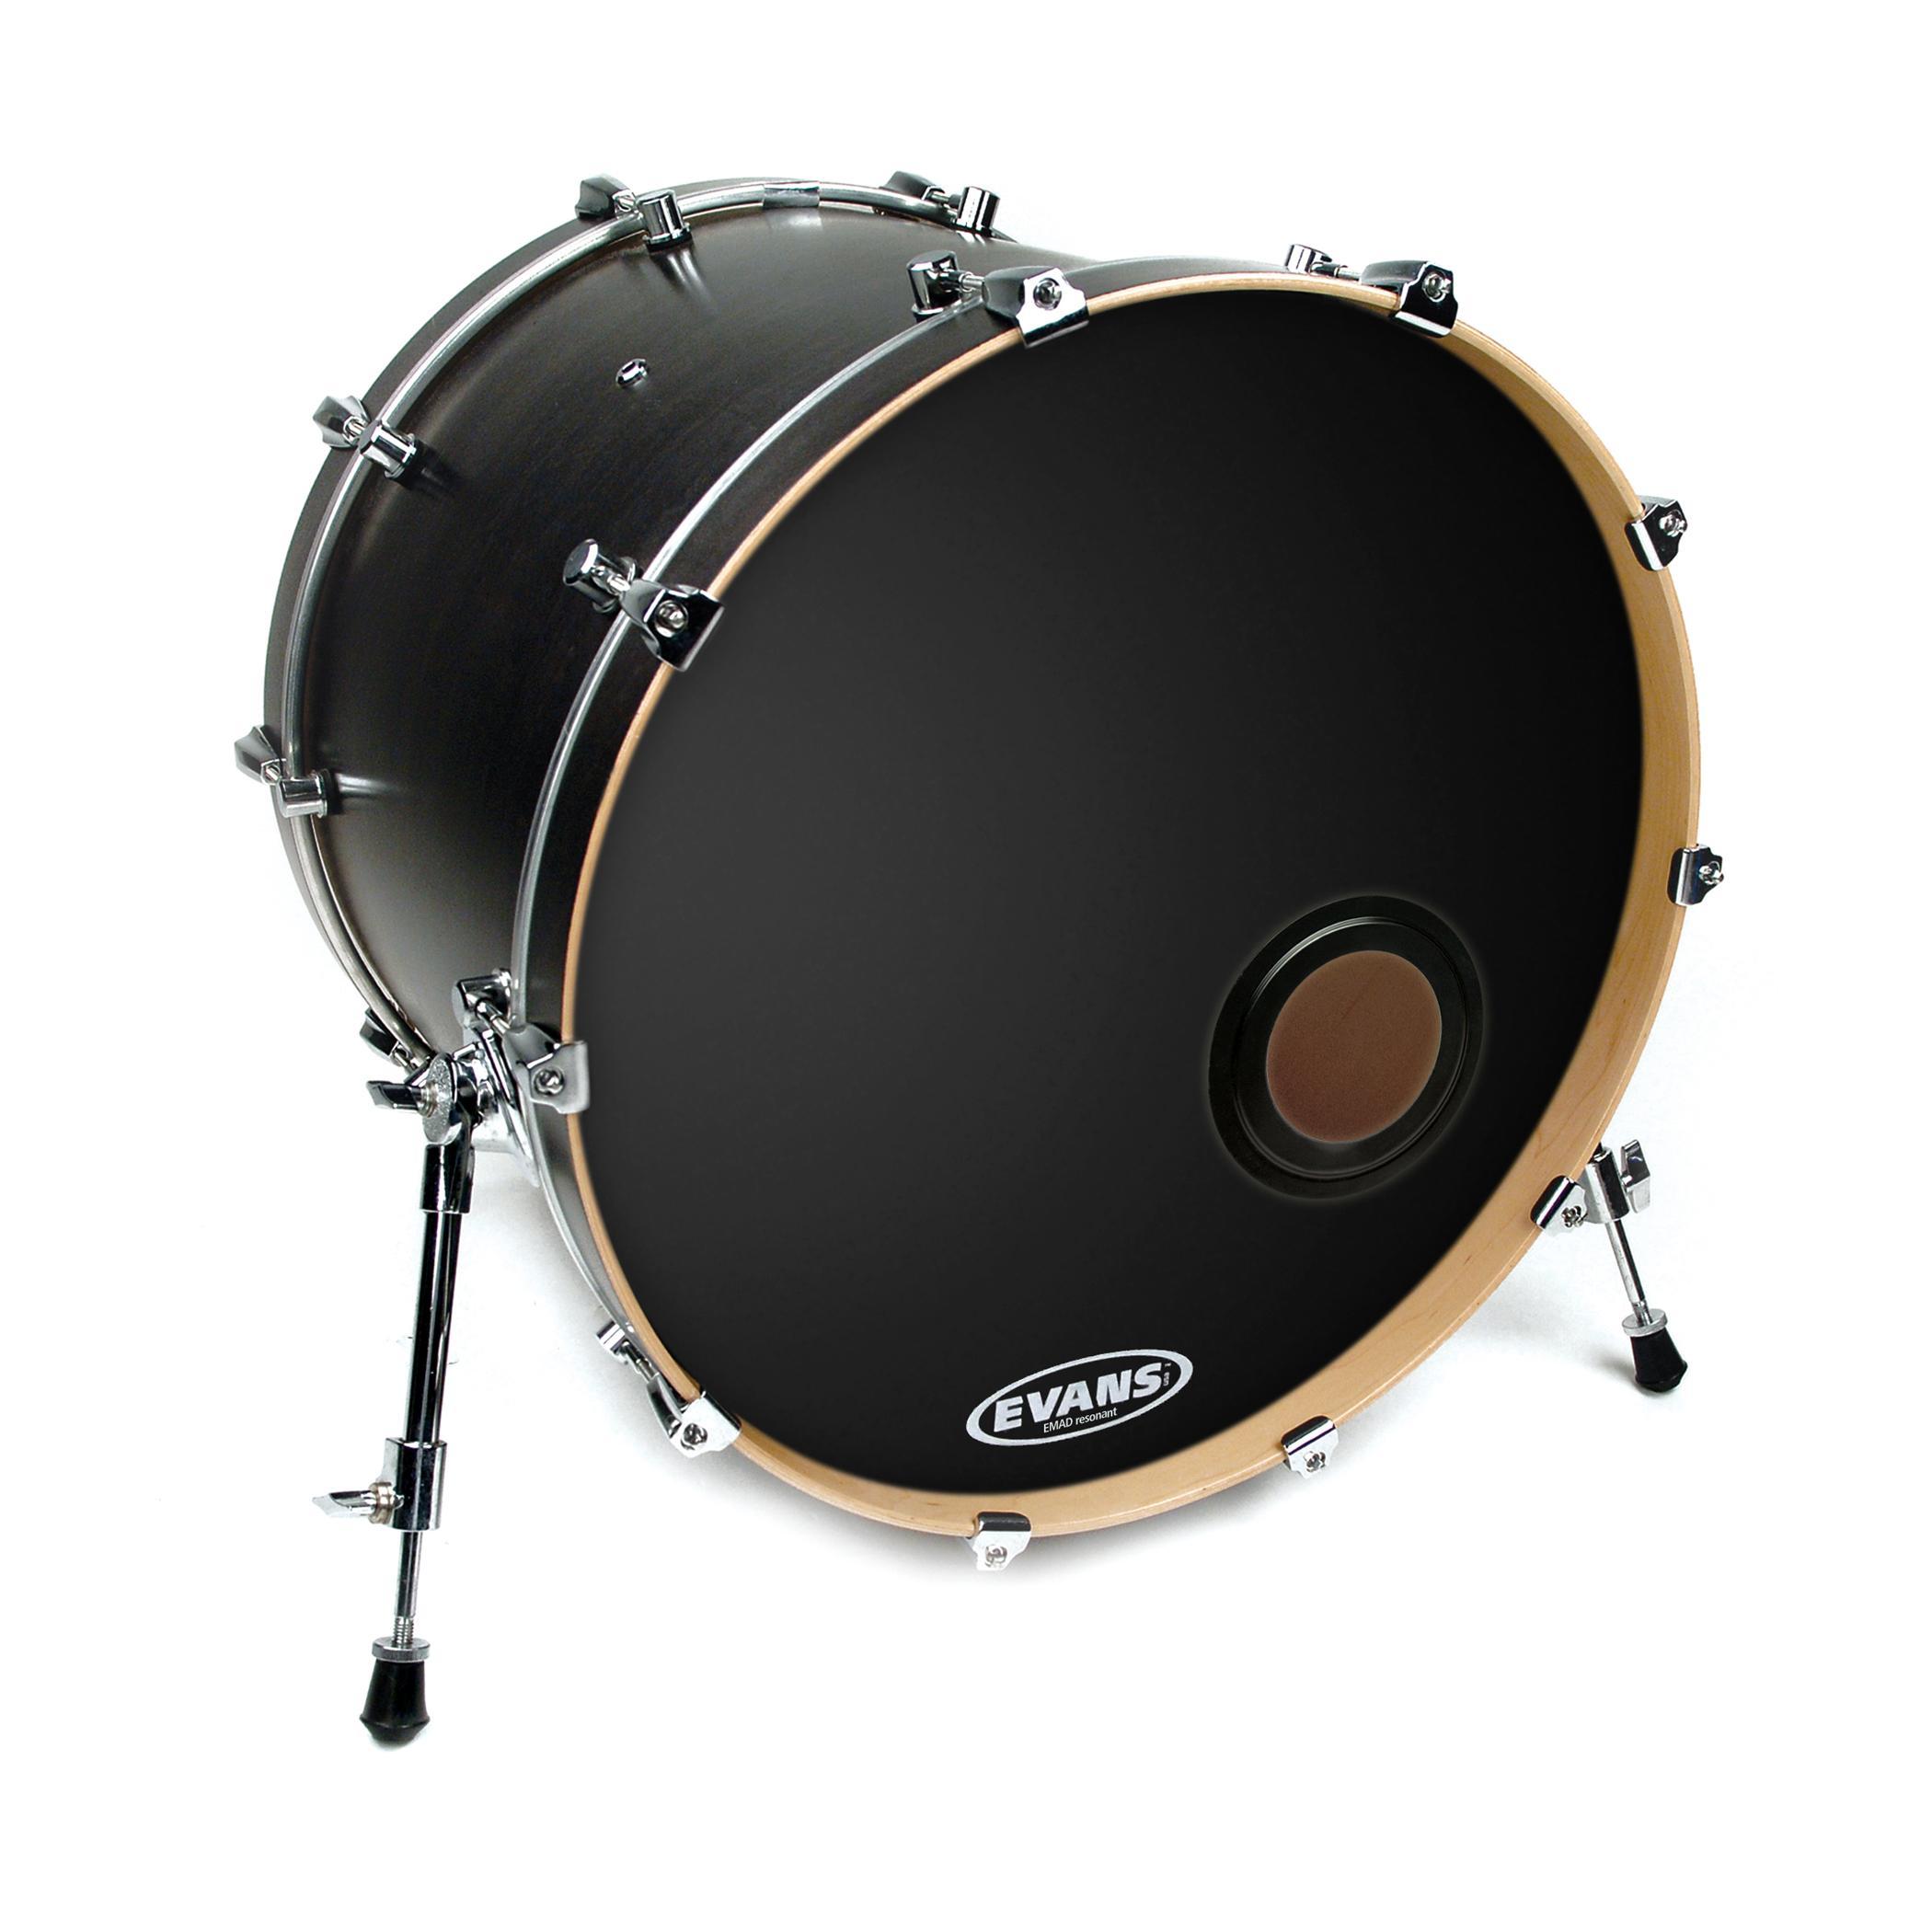 evans remad resonant bass drum head 22 inch musical instruments. Black Bedroom Furniture Sets. Home Design Ideas